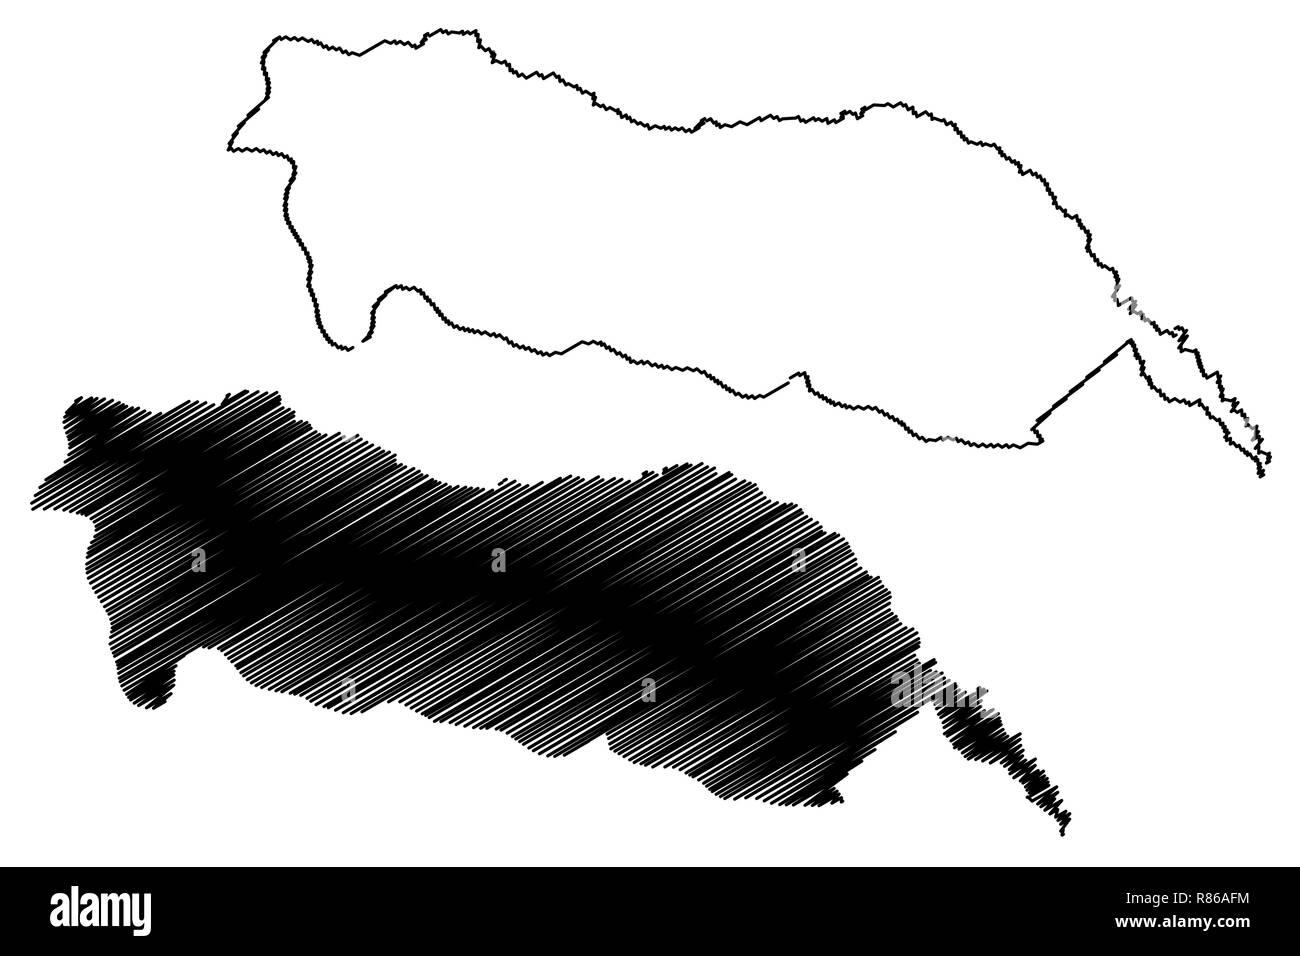 Igdir (Provinces of the Republic of Turkey) map vector illustration, scribble sketch Igdir ili map - Stock Image